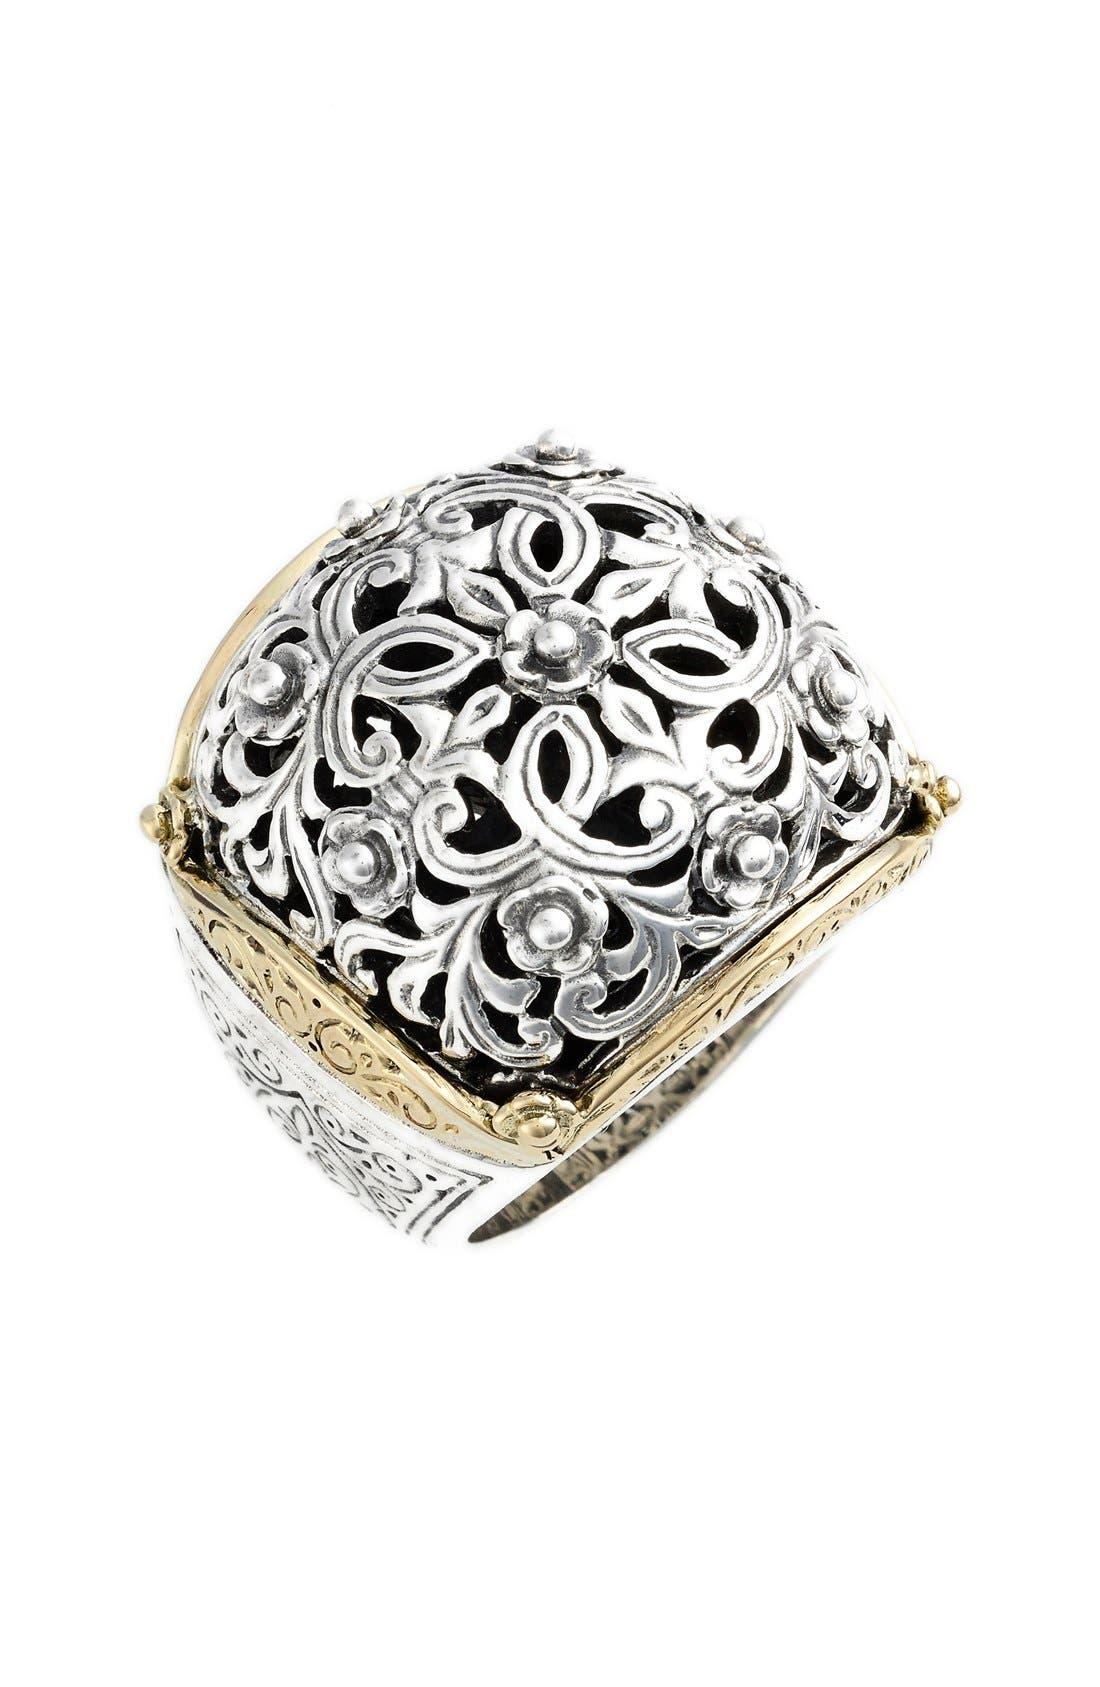 'Silver & Gold Classics' Filigree Ring,                         Main,                         color, Silver/ Gold